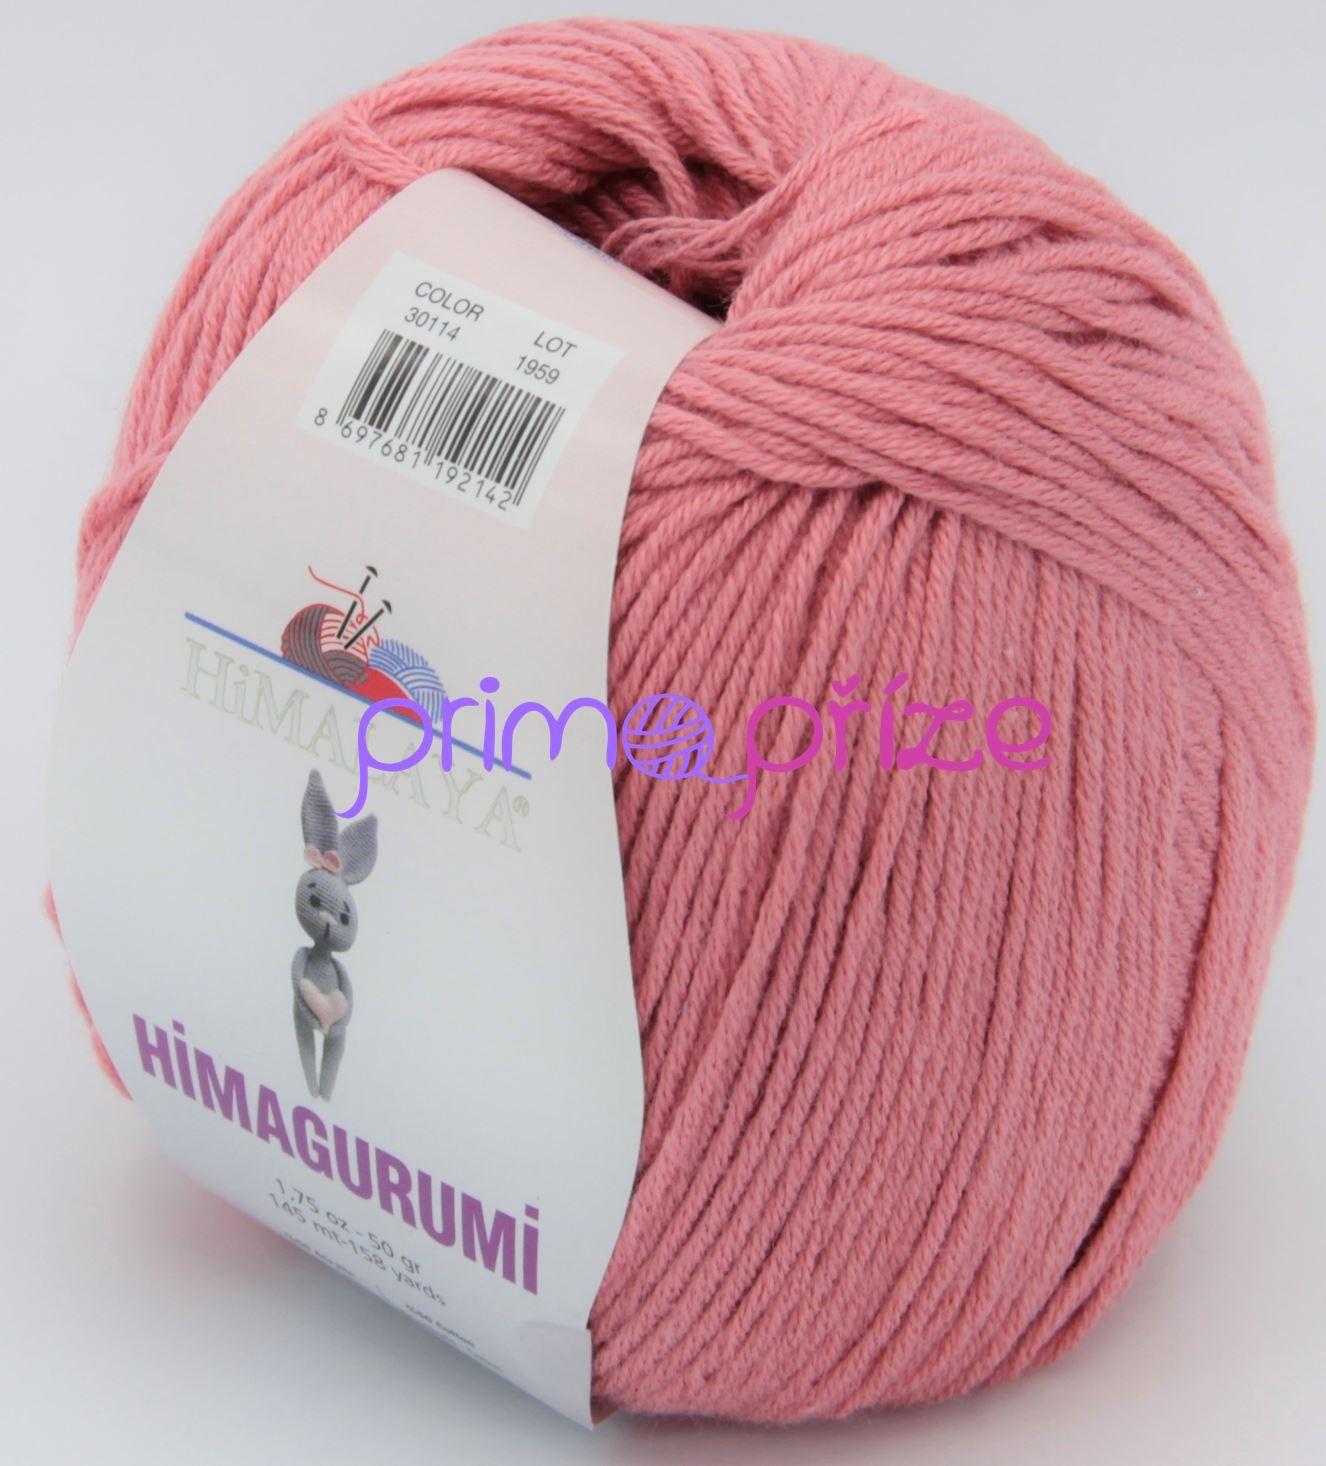 HIMALAYA Himagurumi 30114 starorůžová